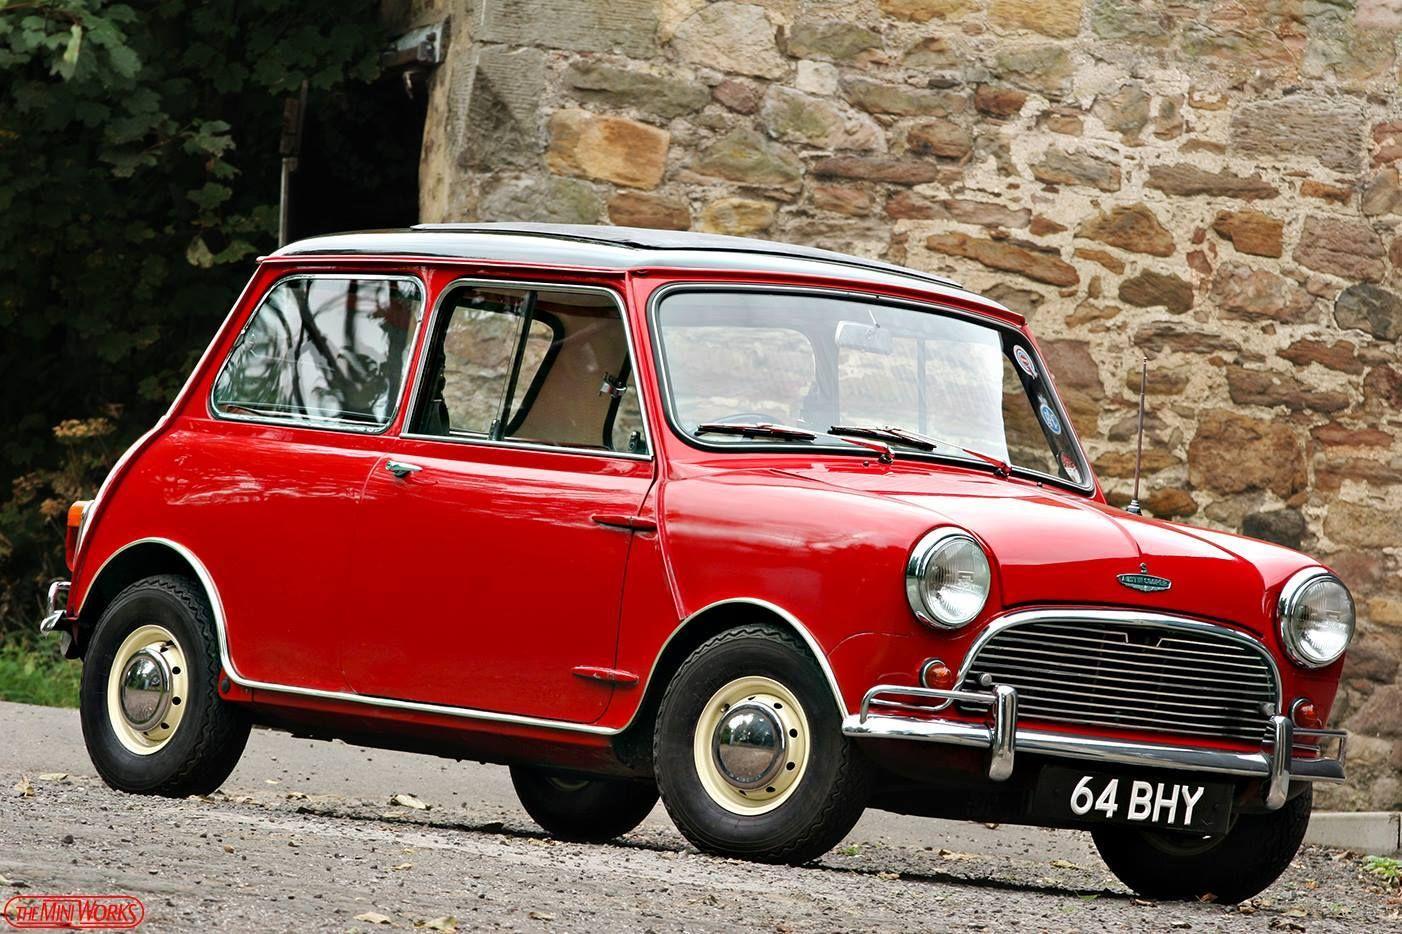 1964 1275 austin mini cooper s mini pinterest minis classic mini and cars. Black Bedroom Furniture Sets. Home Design Ideas